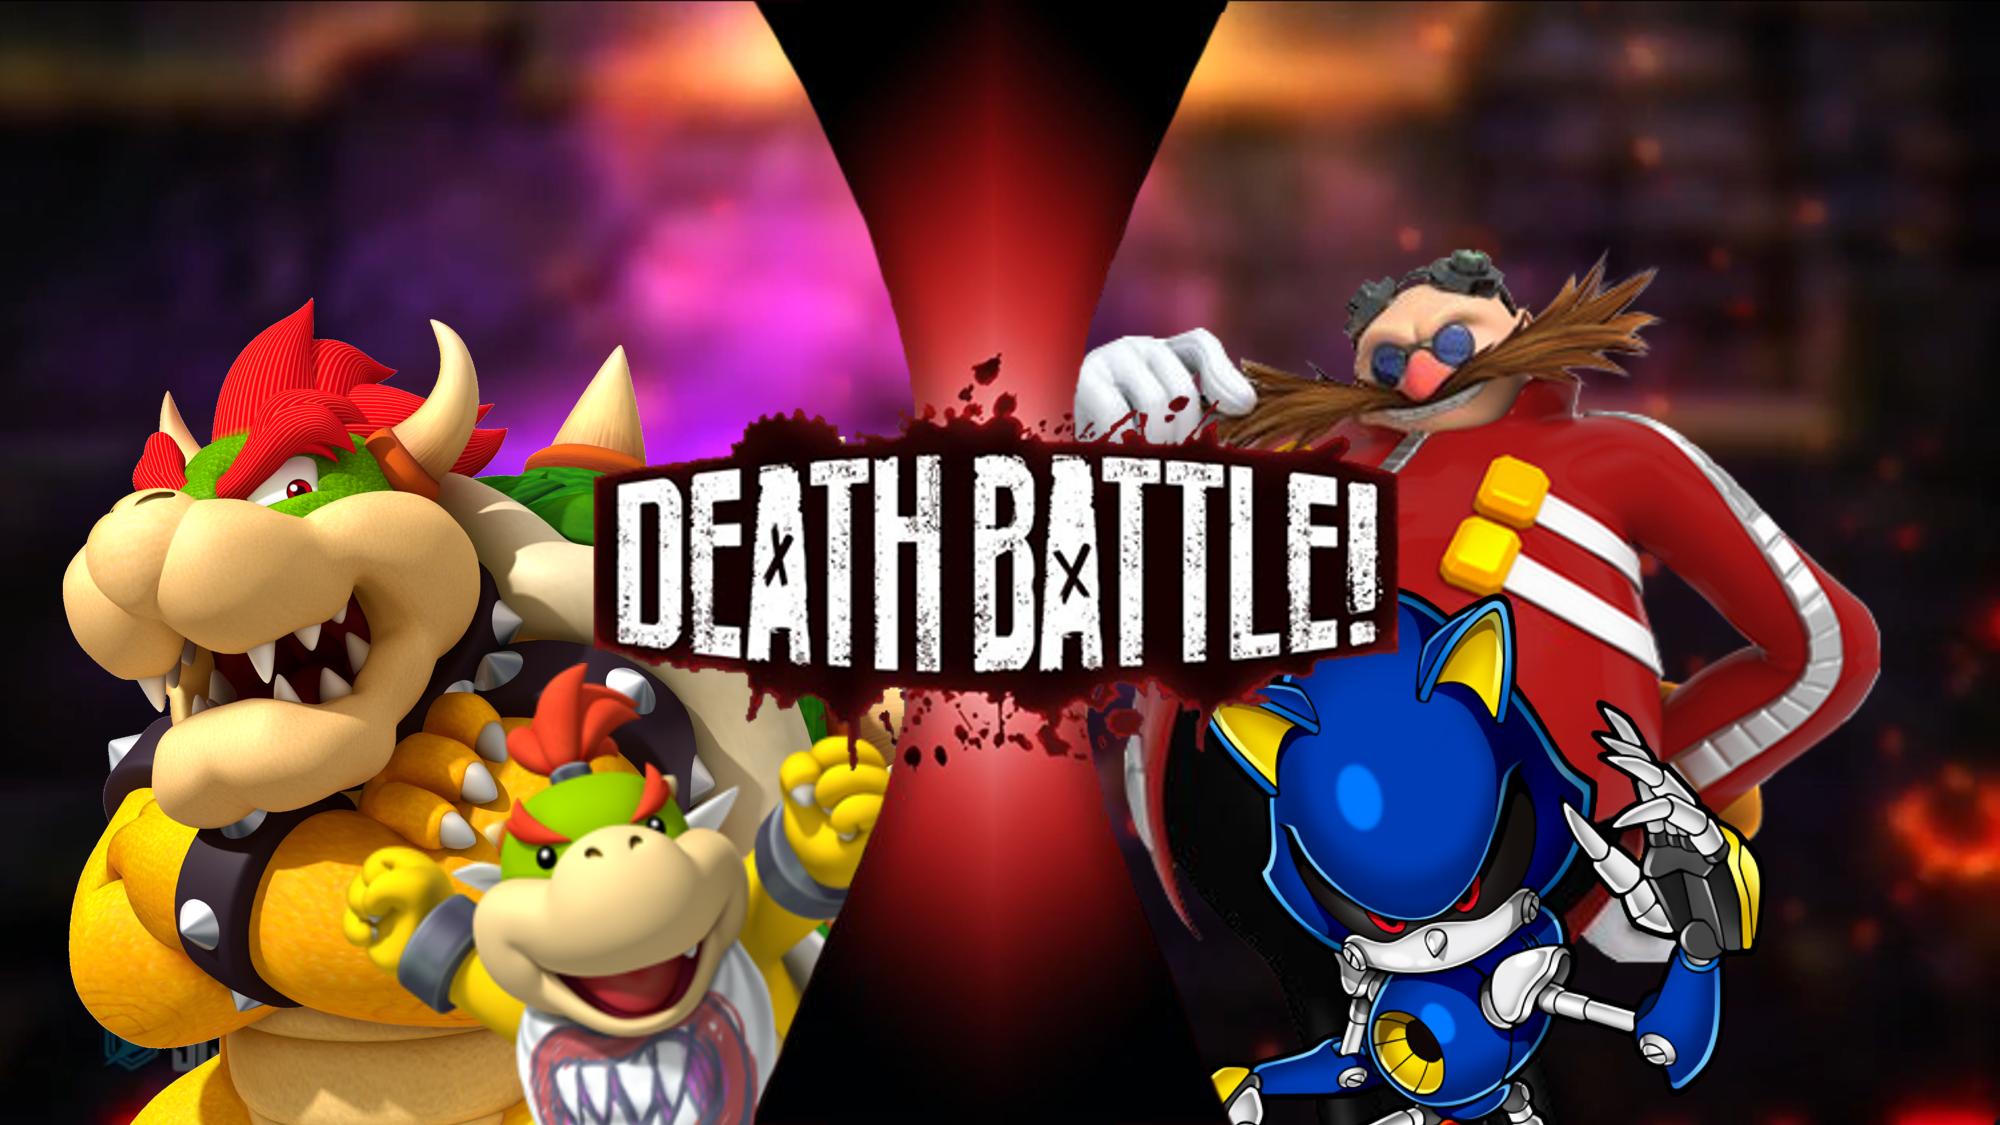 Bowser and Bowser Jr  VS Dr  Eggman and Metal Sonic | Death Battle